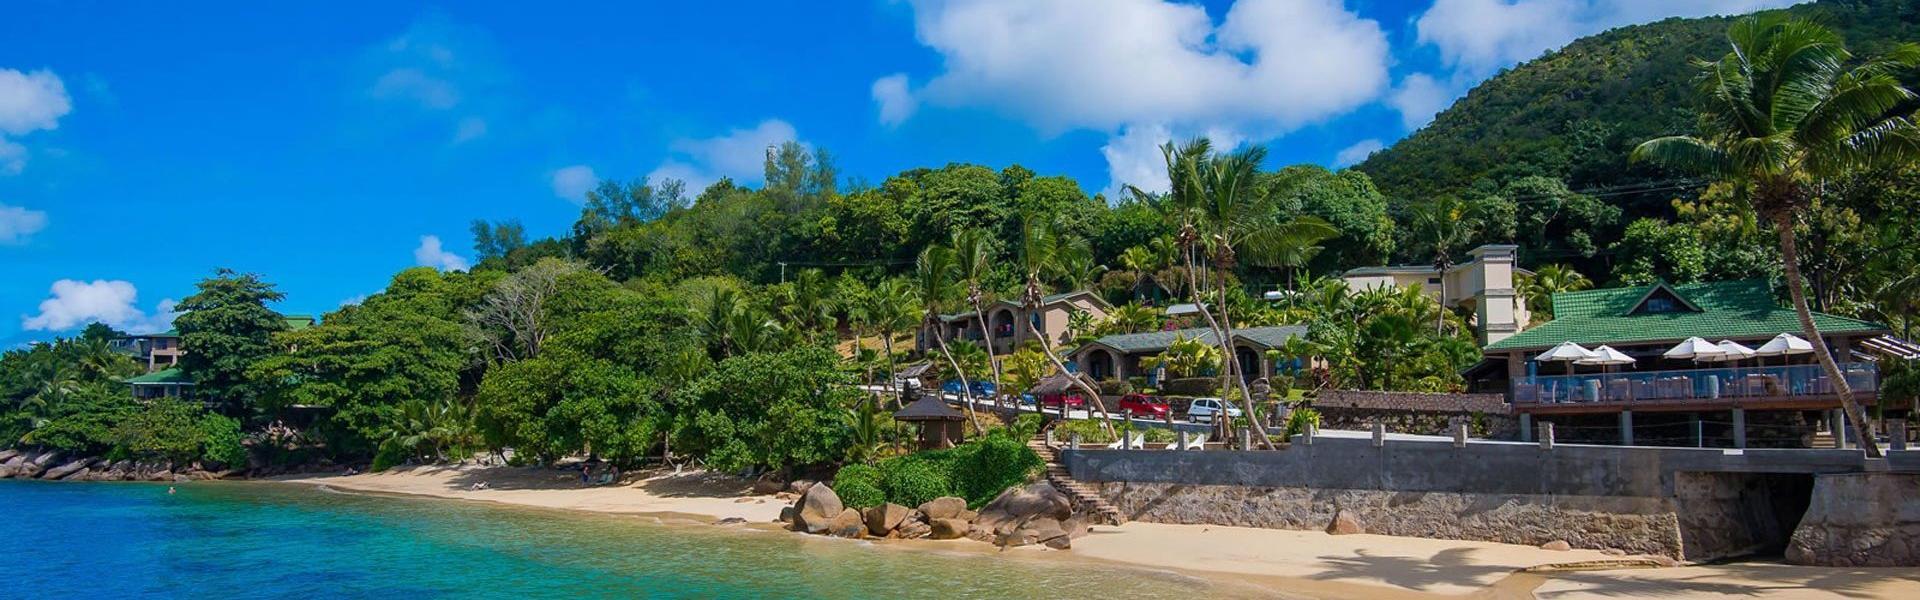 Coco de Mer Hotel & Black Parrot Suites (Seychelle szigeteki utazások)